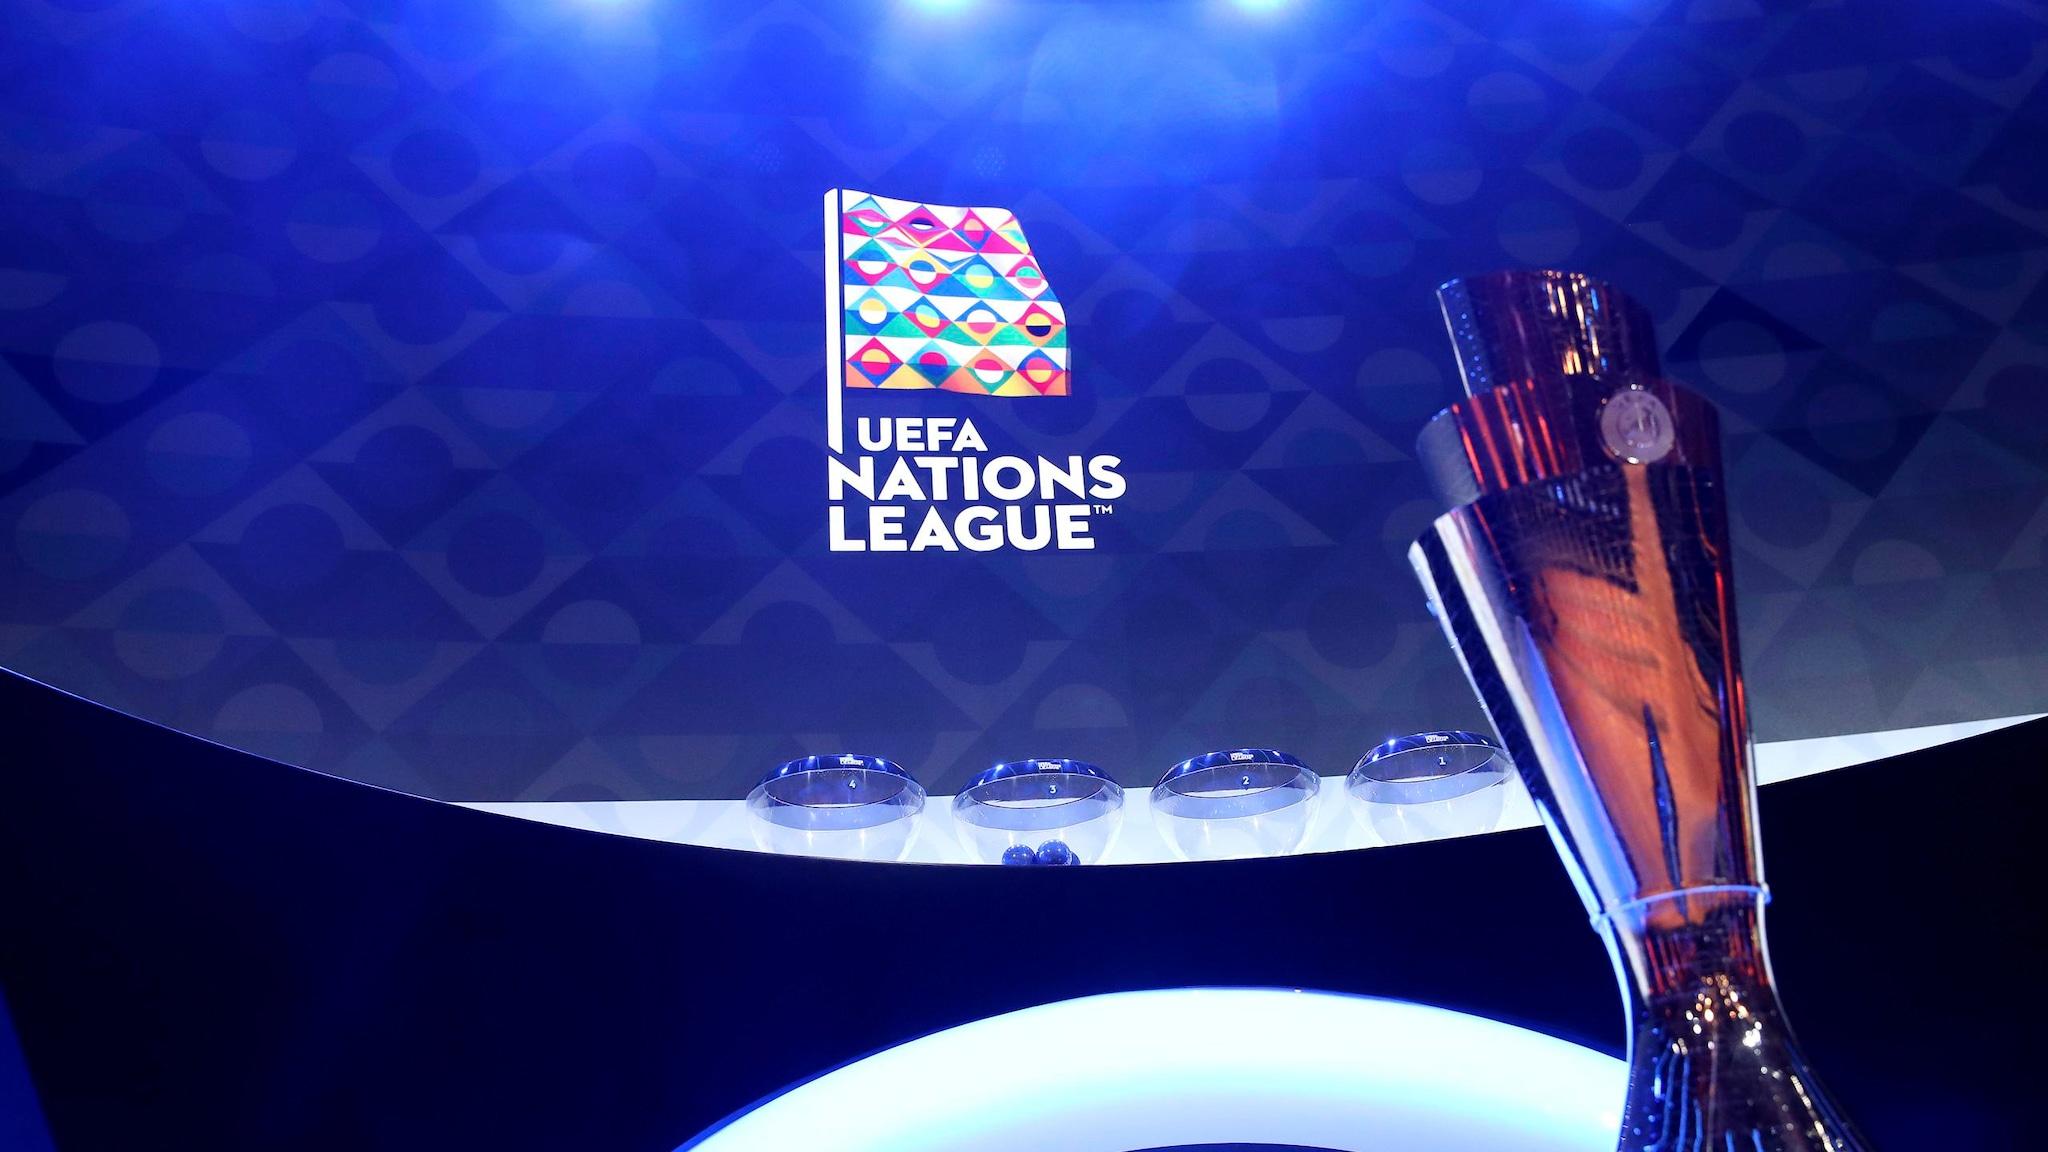 Circuit Le Vigeant Calendrier 2022 Ligue Des Nations De L Uefa 2021 2022 Calendrier | Calendrier Mar 2021